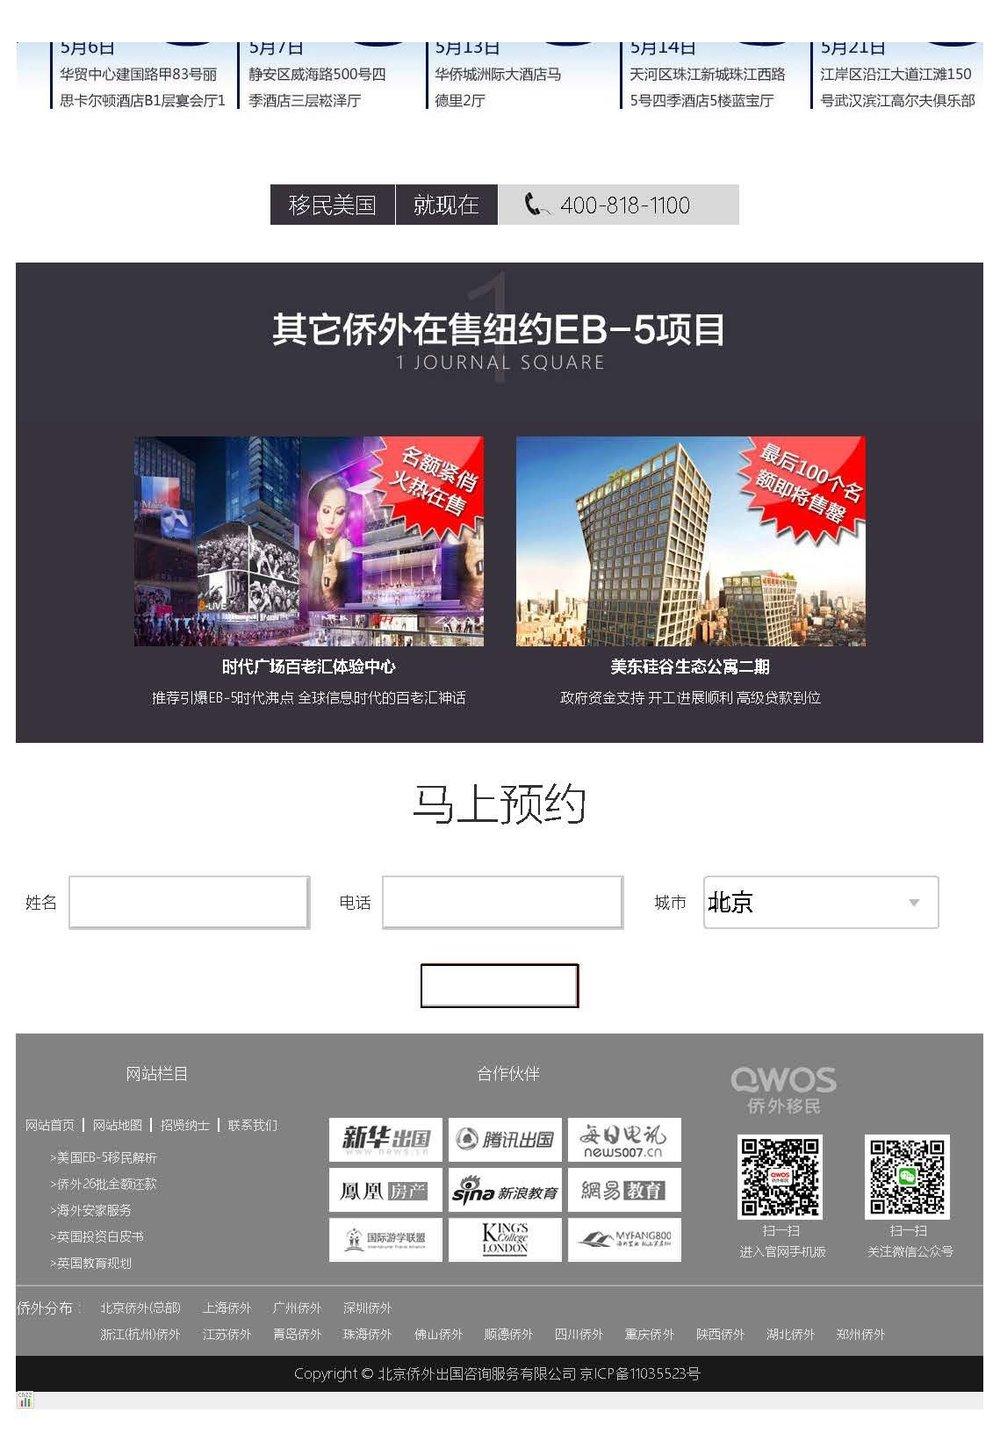 kushner-beijing-ad_Page_3.jpg